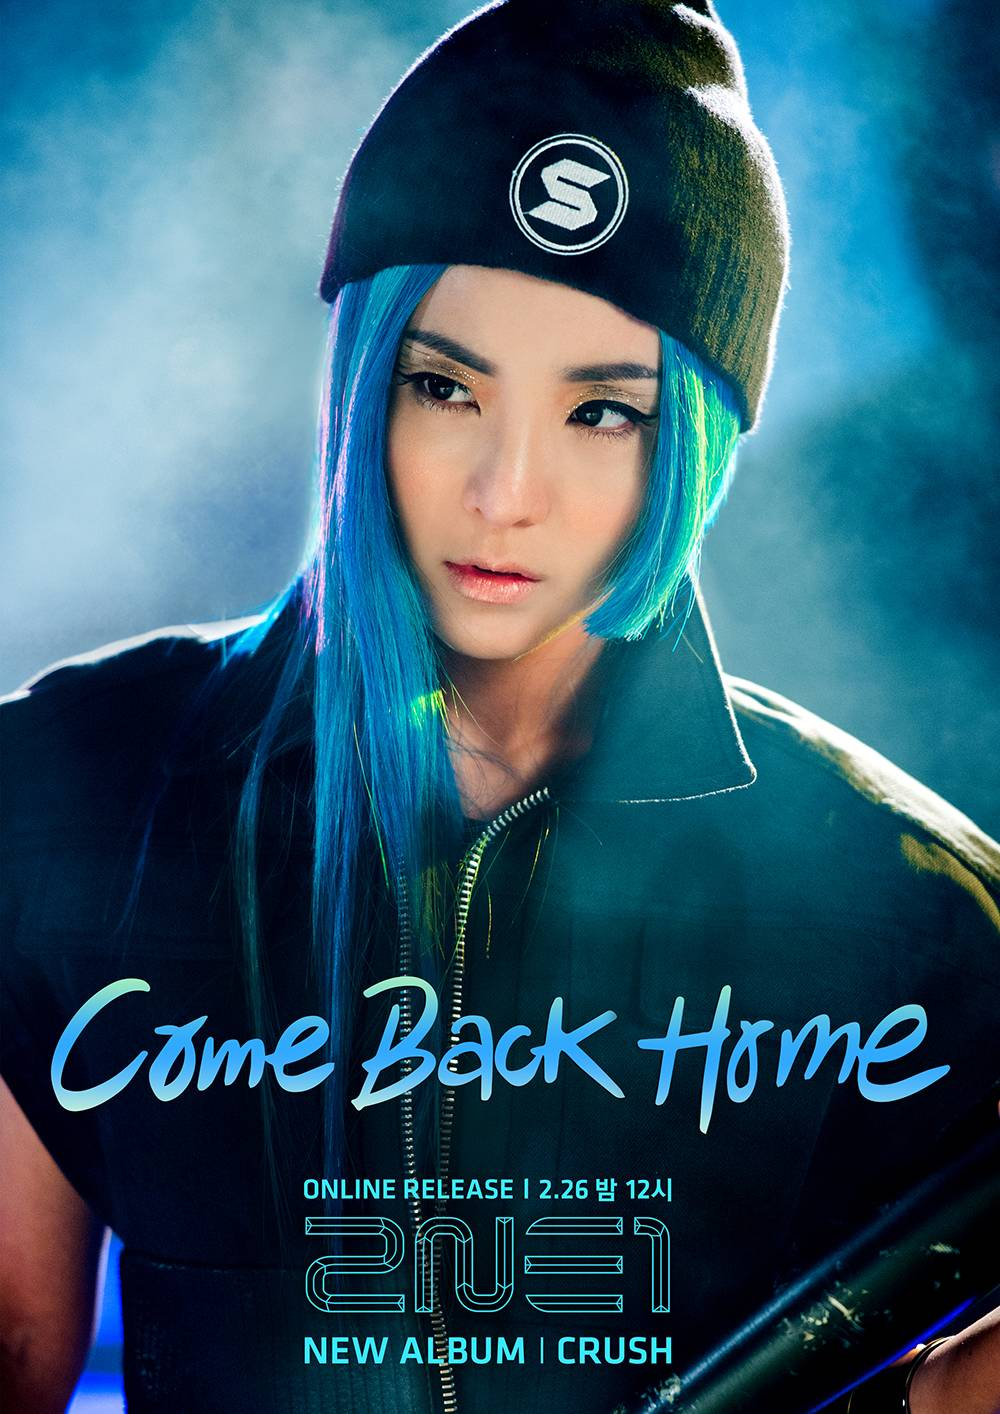 2ne1 drops dara minzy 39 s image teaser for their 39 crush - 2ne1 come back home wallpaper ...